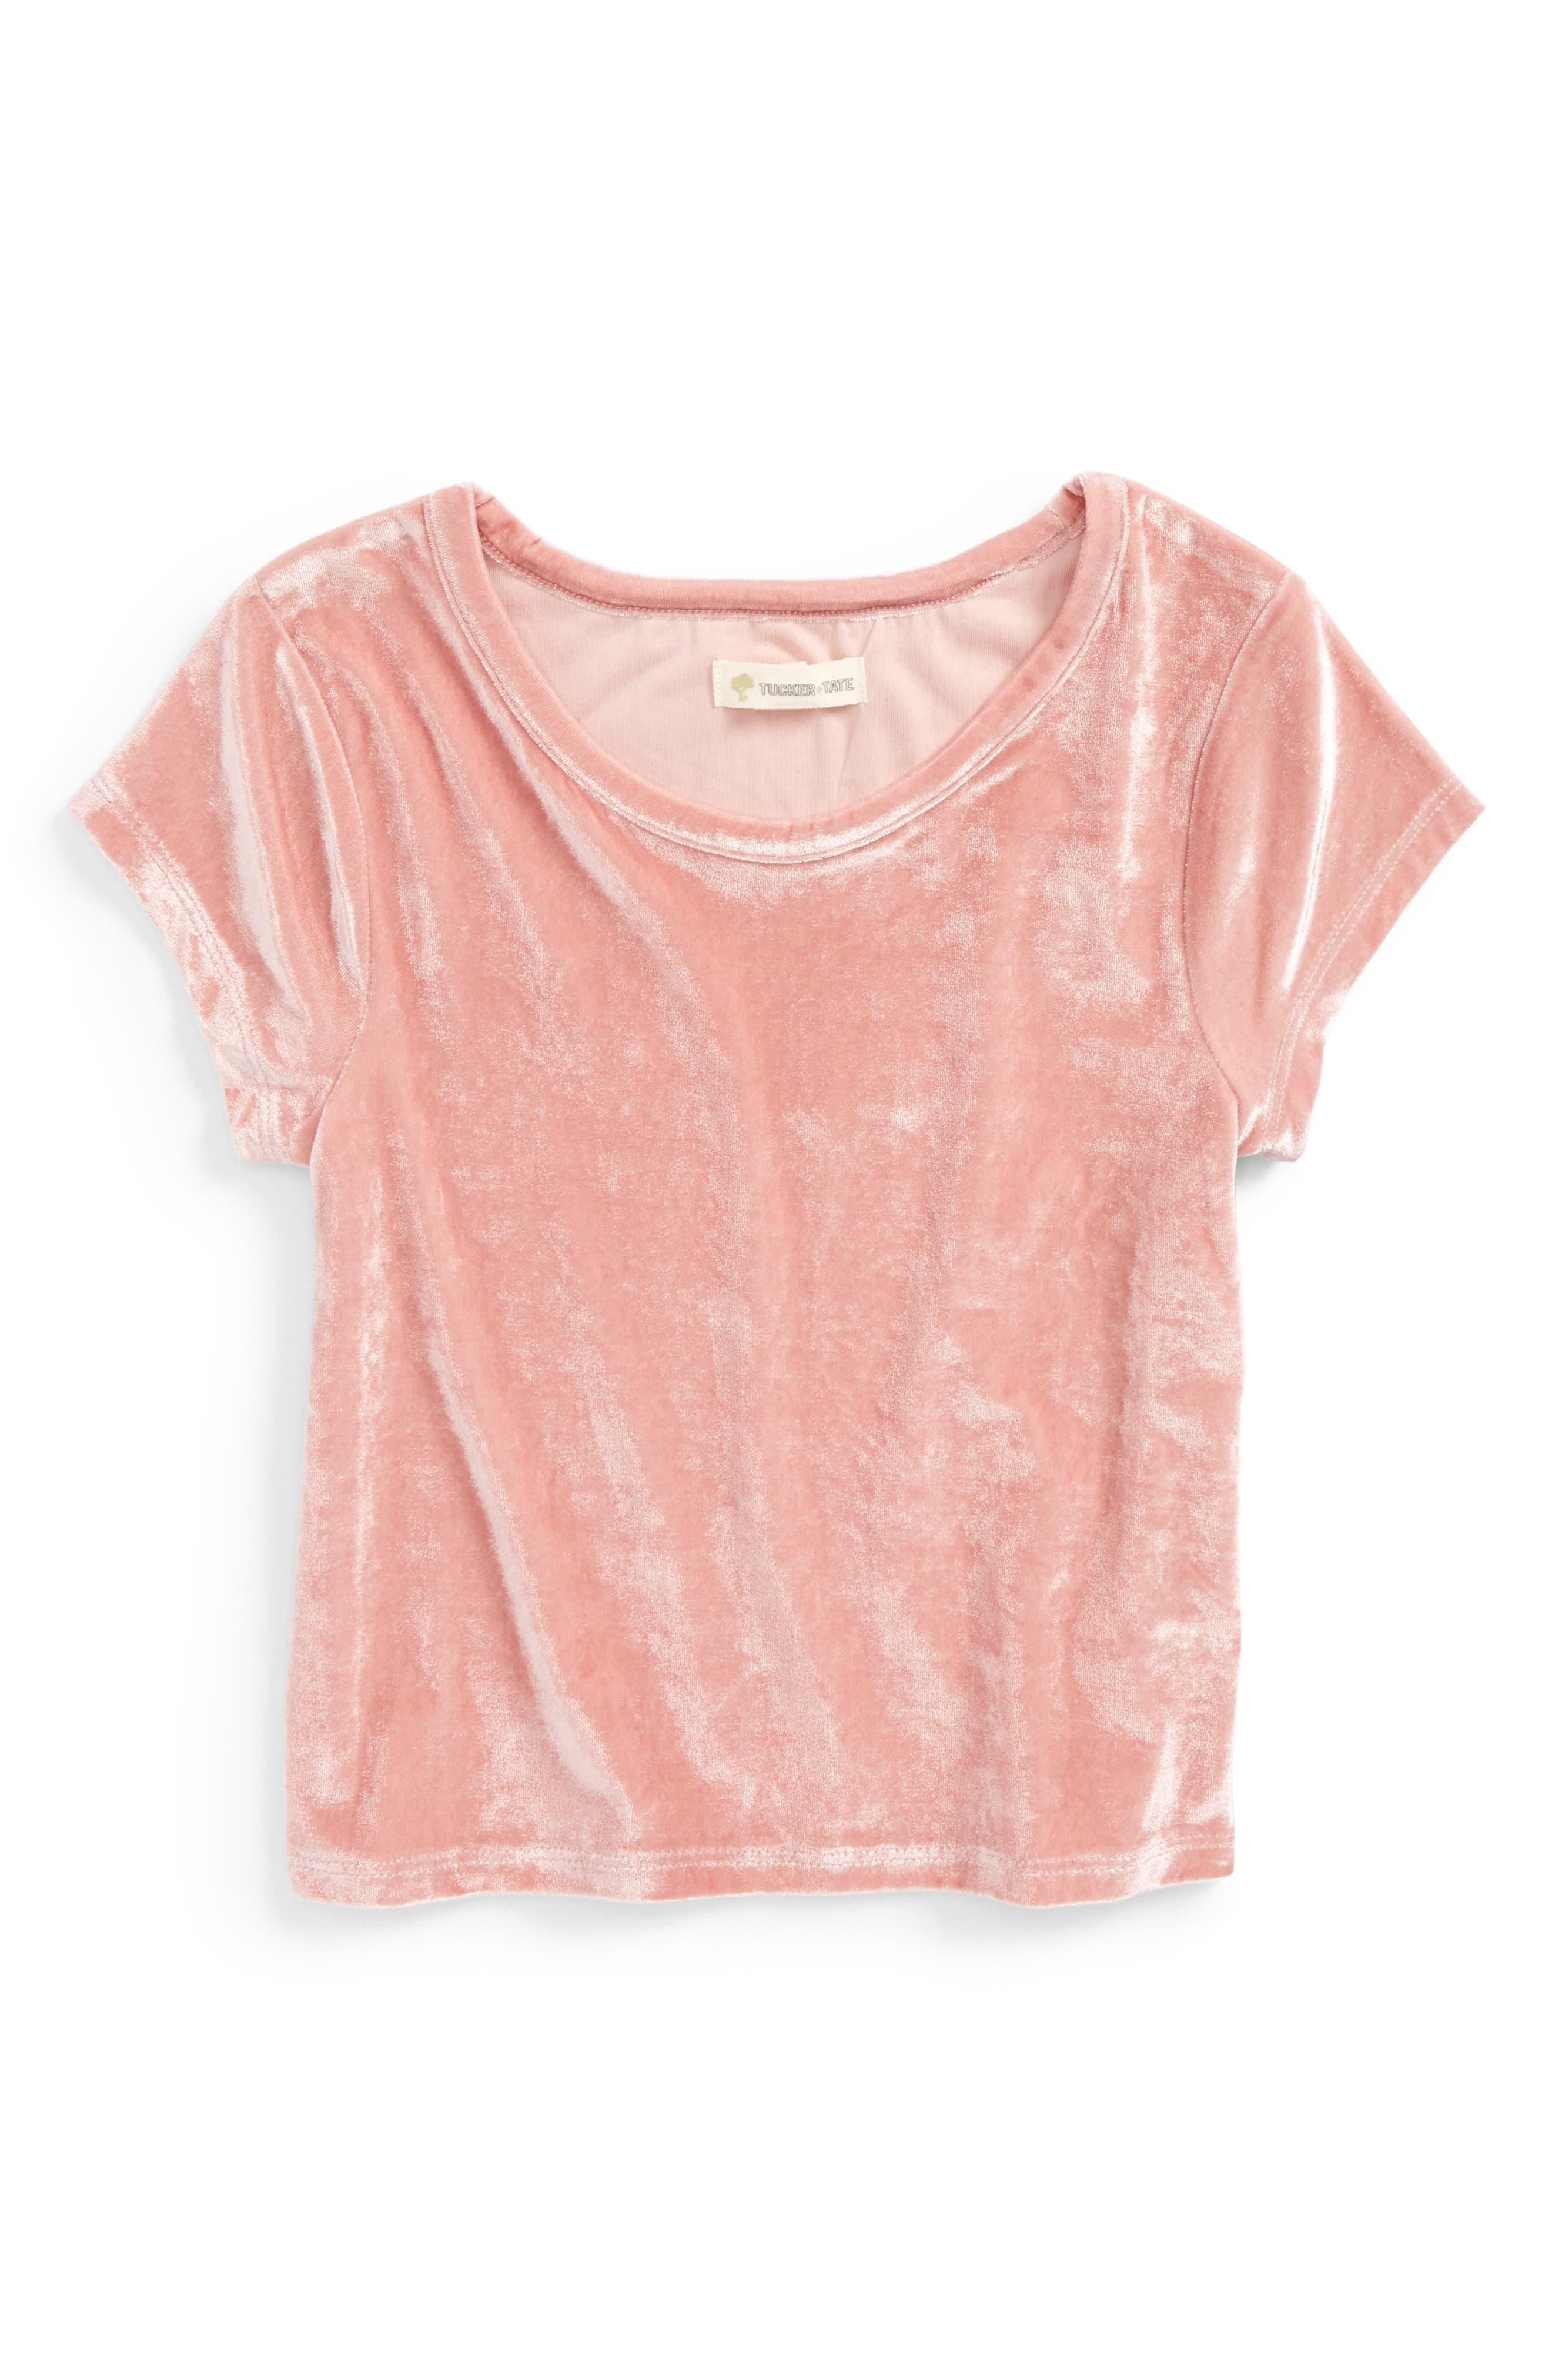 Velvet Tee,                         Main,                         color, Pink Zephyr